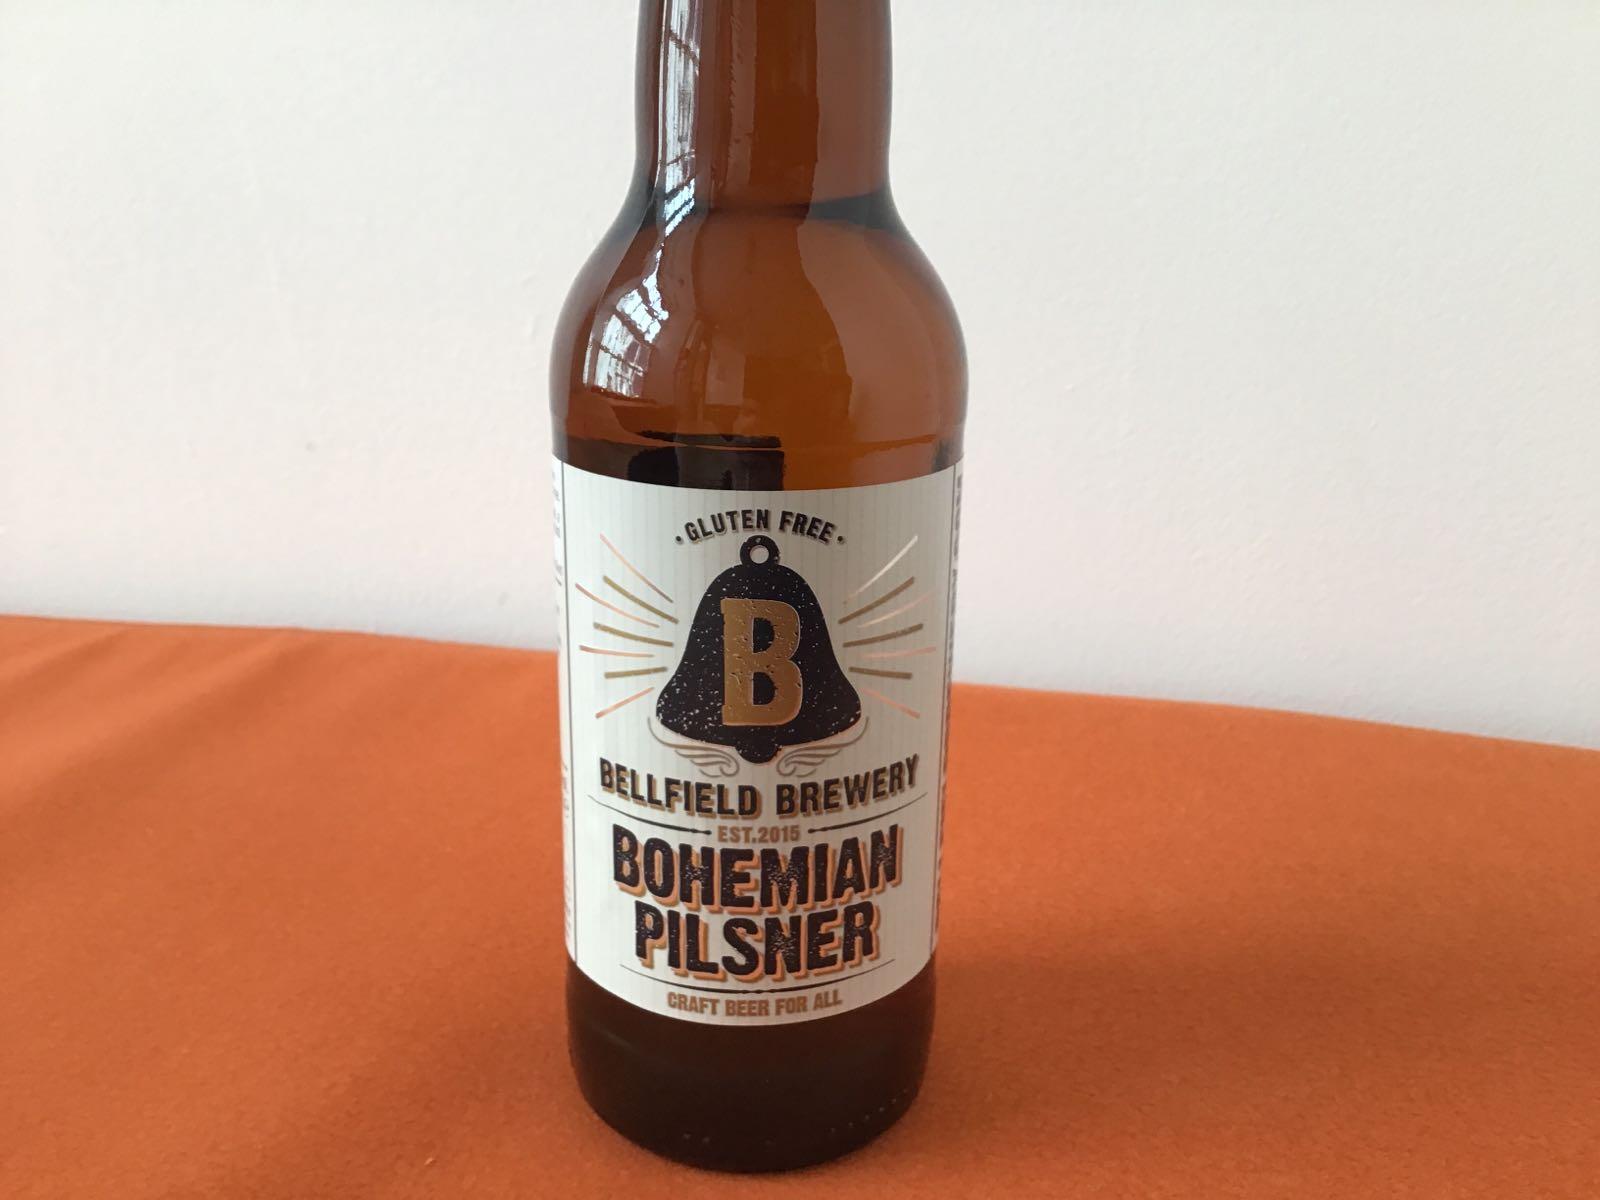 Bellfield Brewery: Bohemian Pilsner Gluten Free